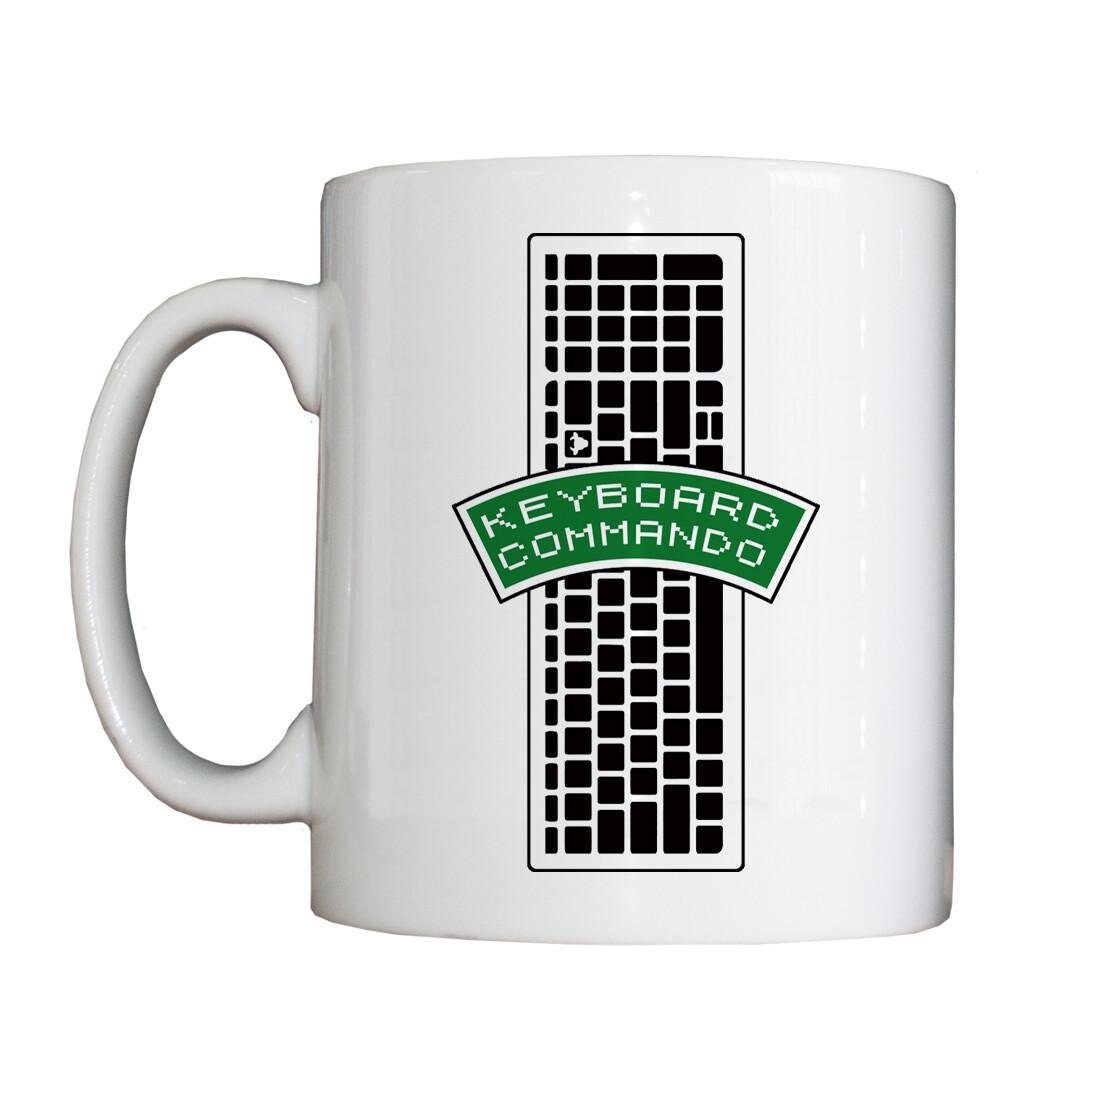 Personalised 'Keyboard Commando' Drinking Vessel